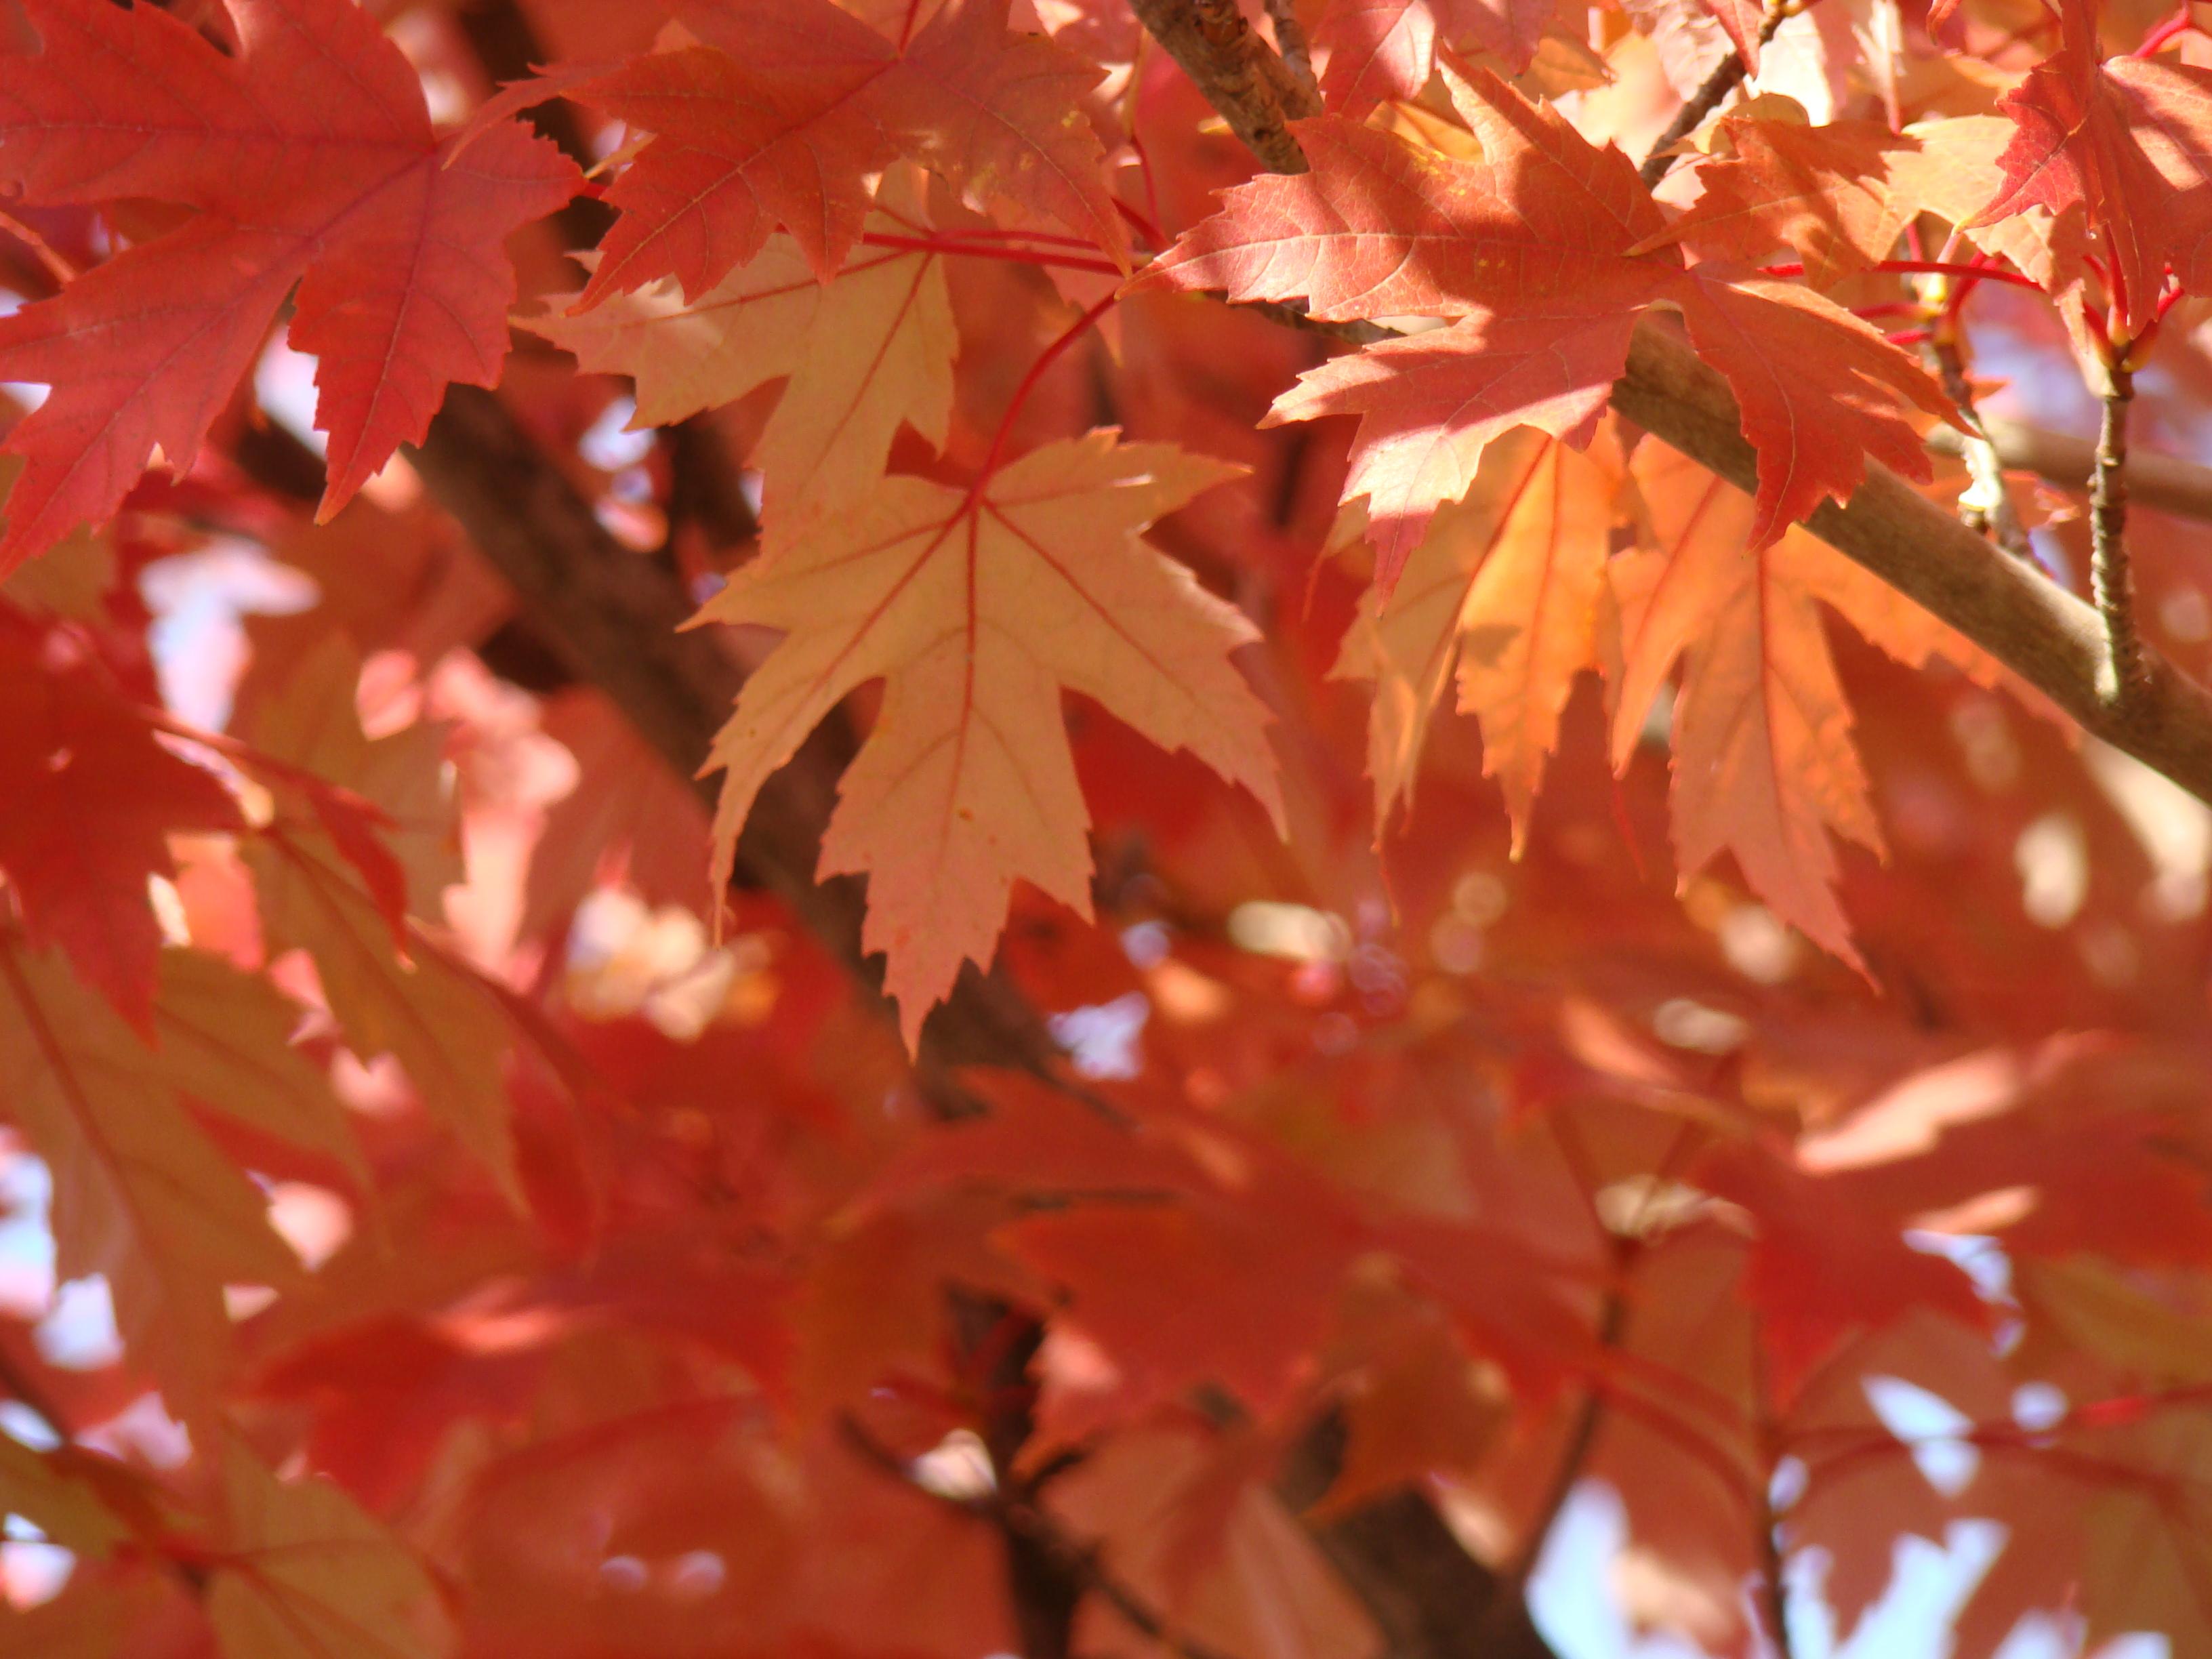 FALL TREES Art Prints Gifts Orange Autumn Leaves Baslee Trou